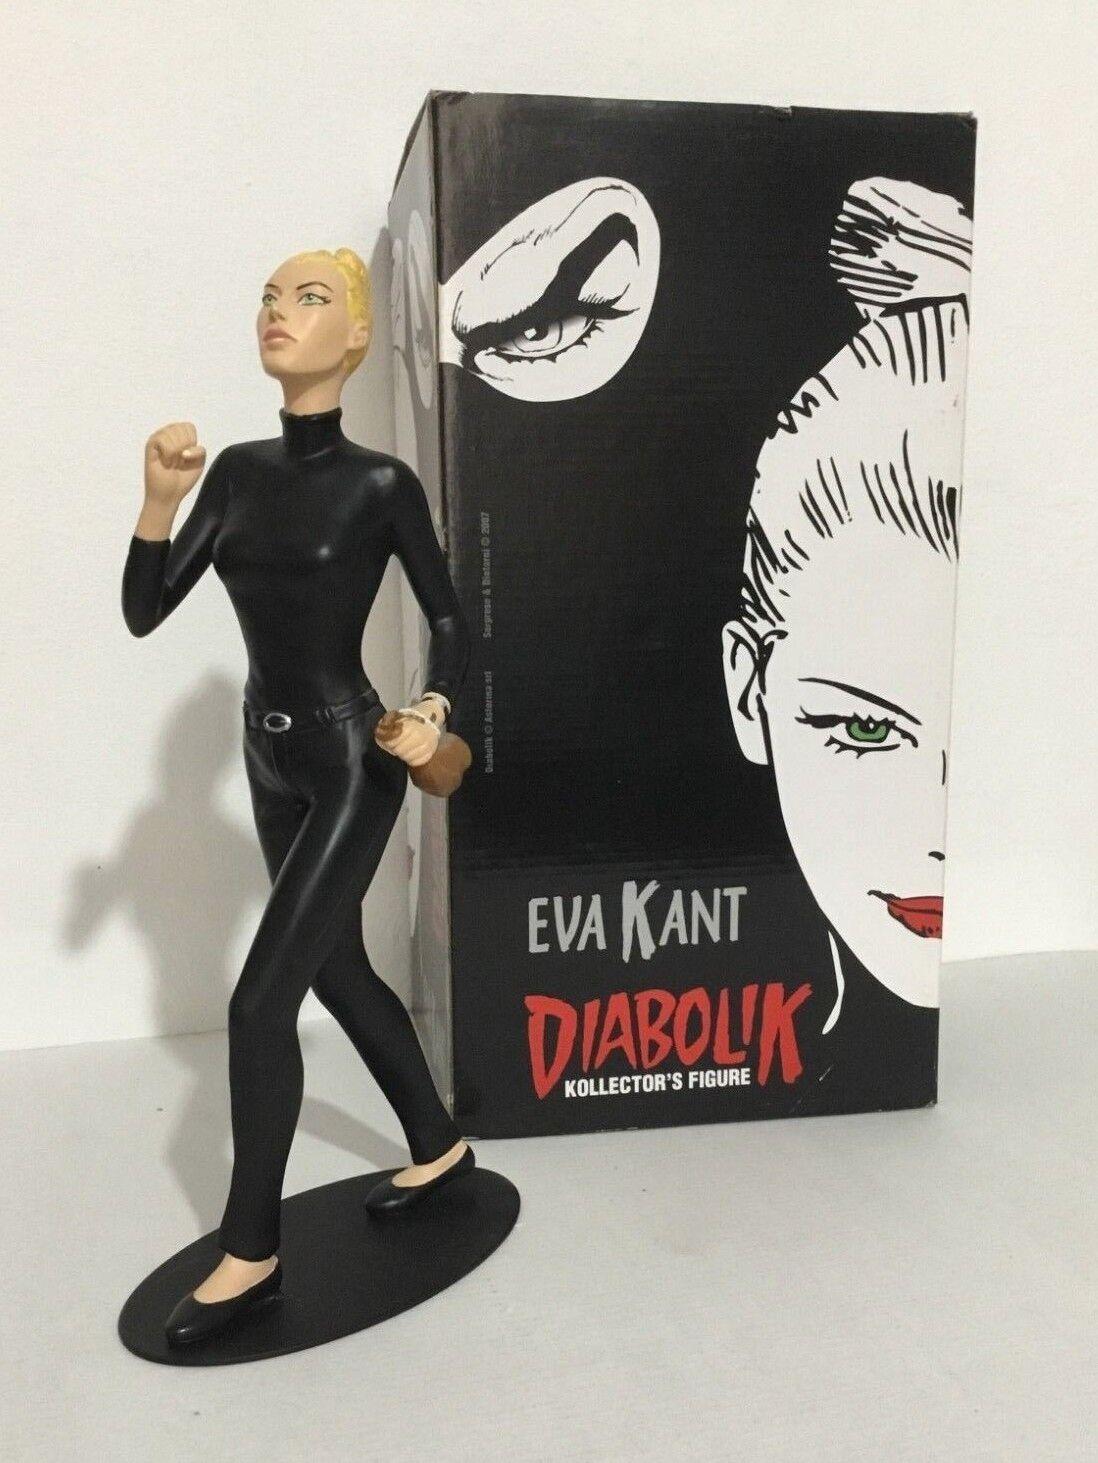 STATUA EVA KANT IN FUGA Diabolik Kollector's Figure idea regalo  29cm